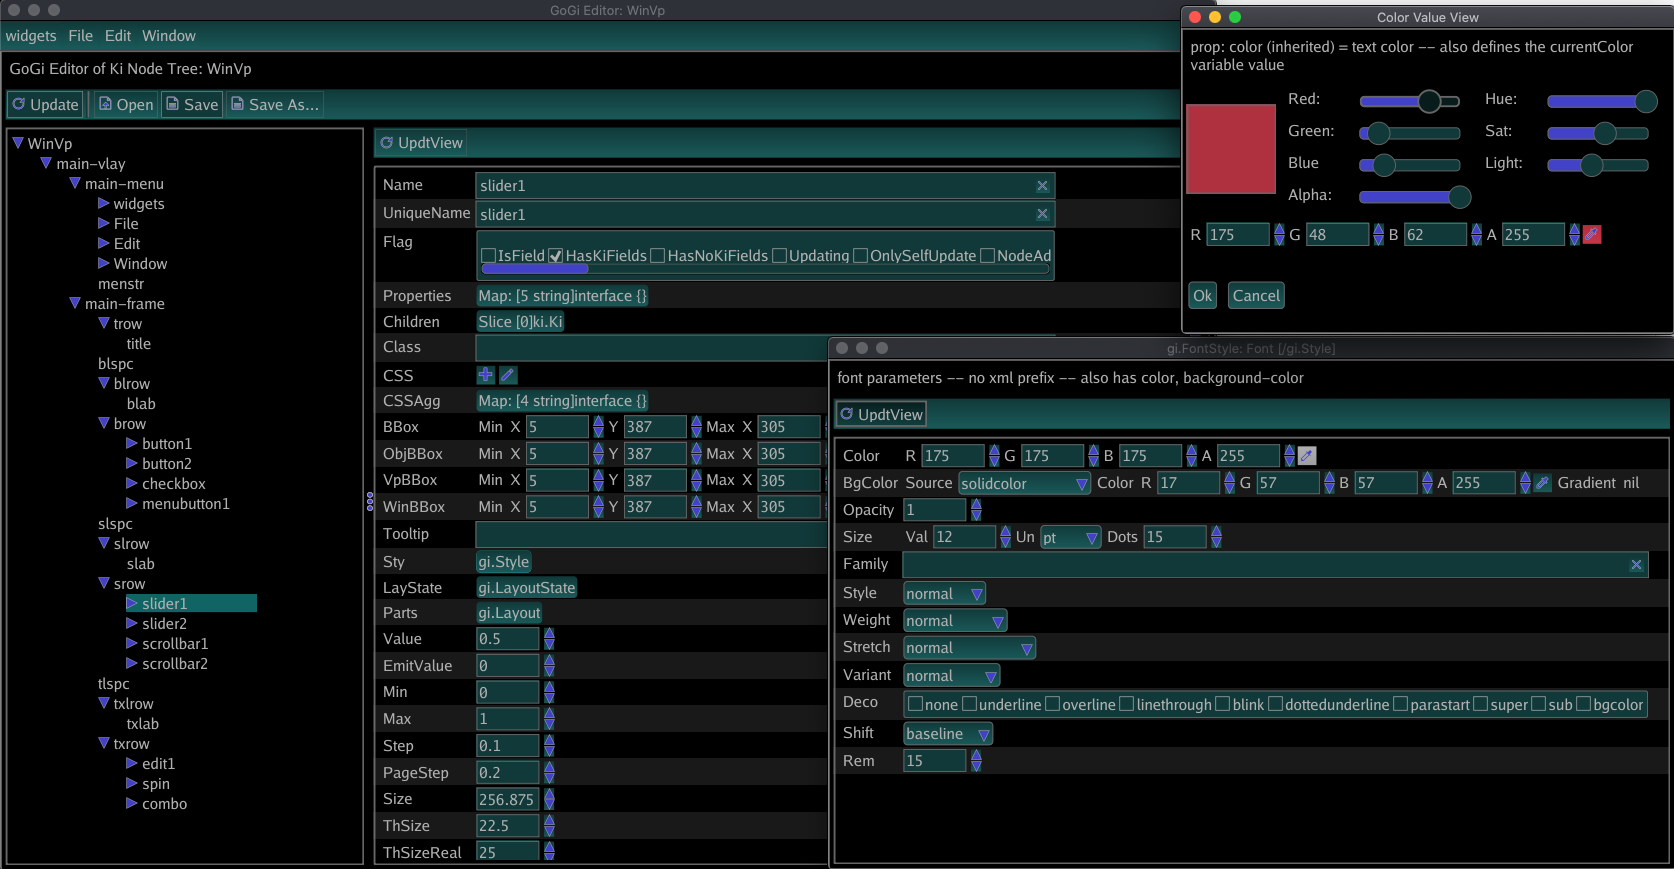 Screenshot of GiEditor, Dark mode